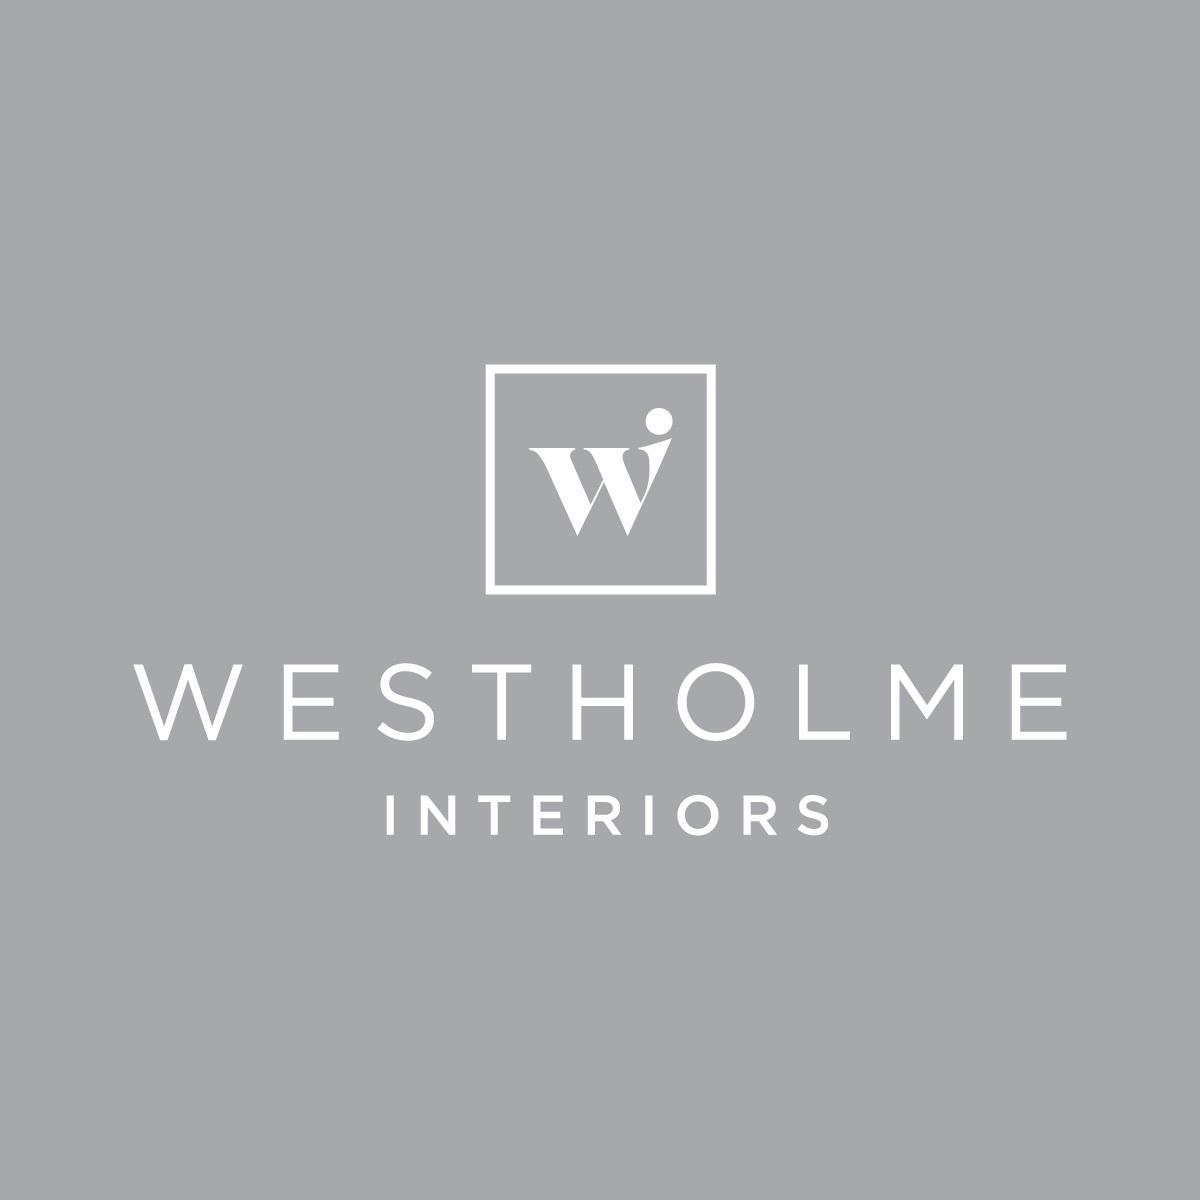 Westholme Interiors